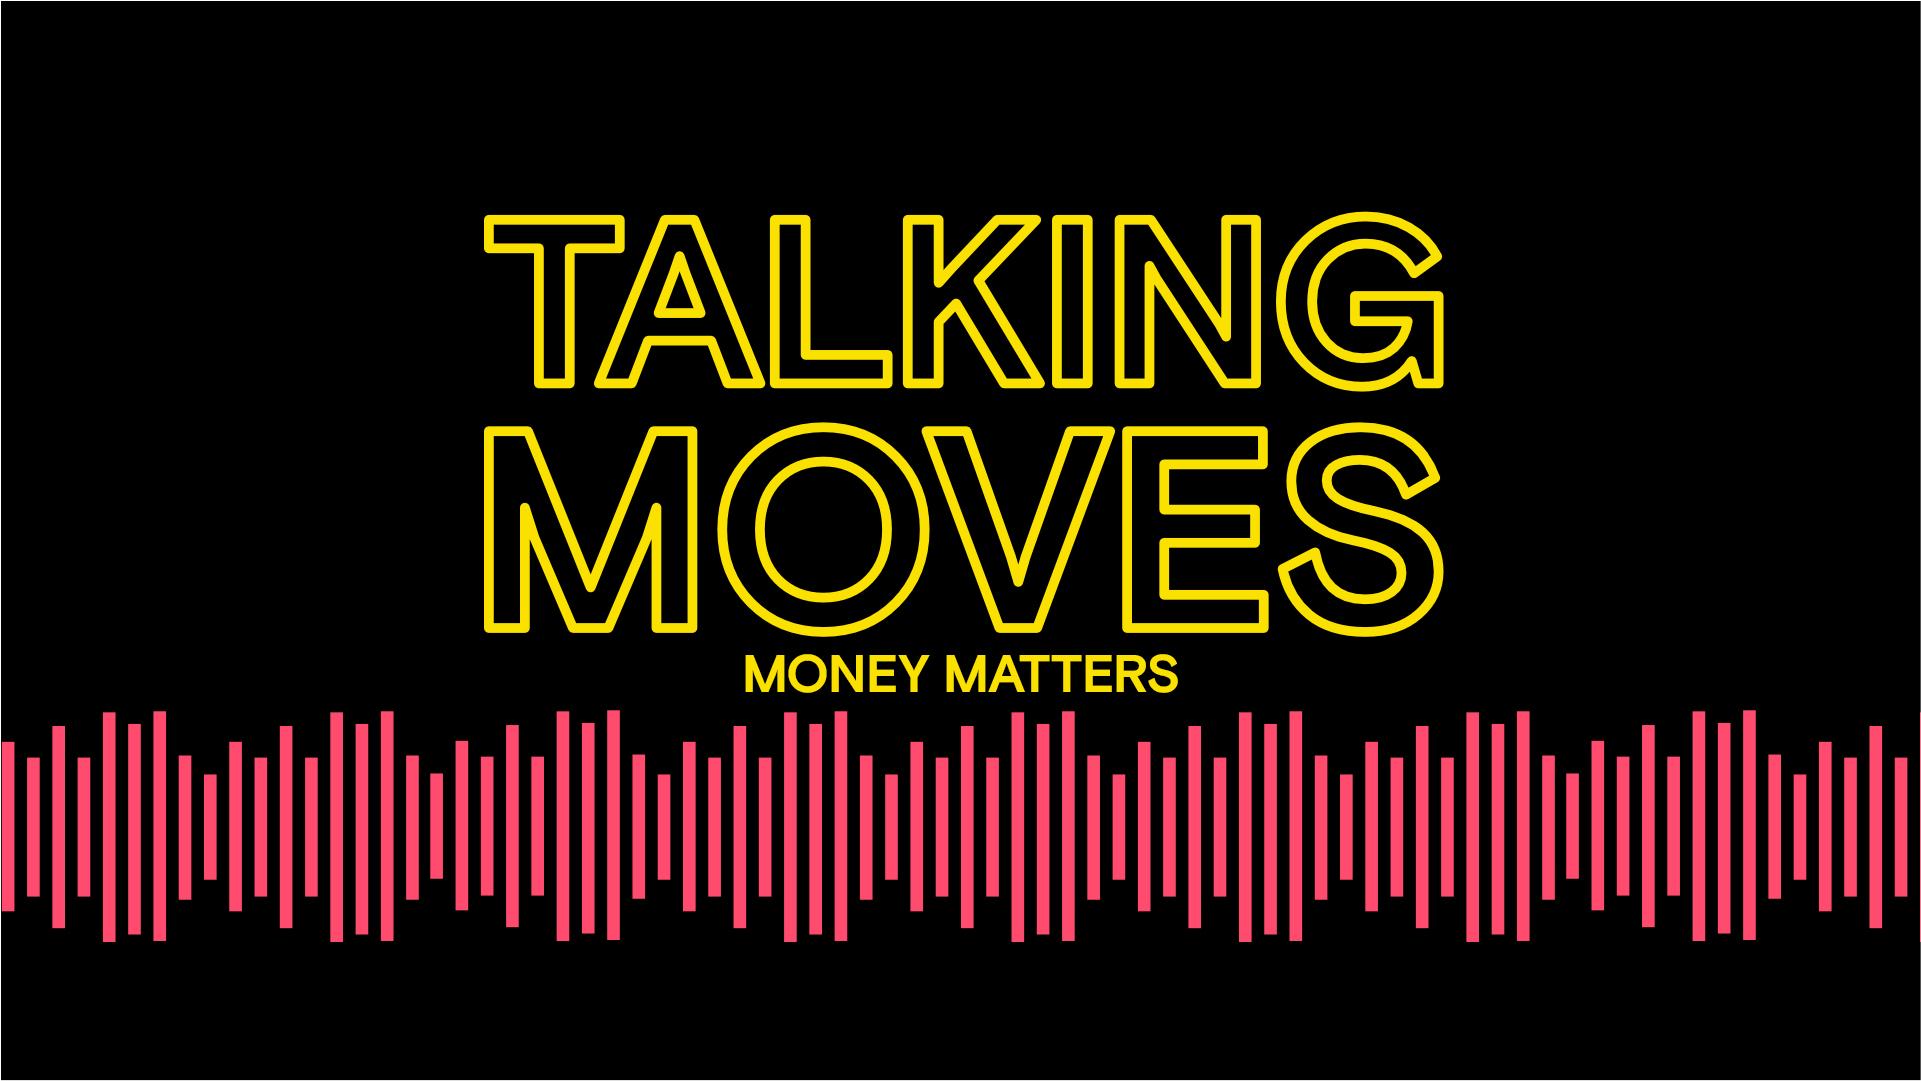 Money Matters title